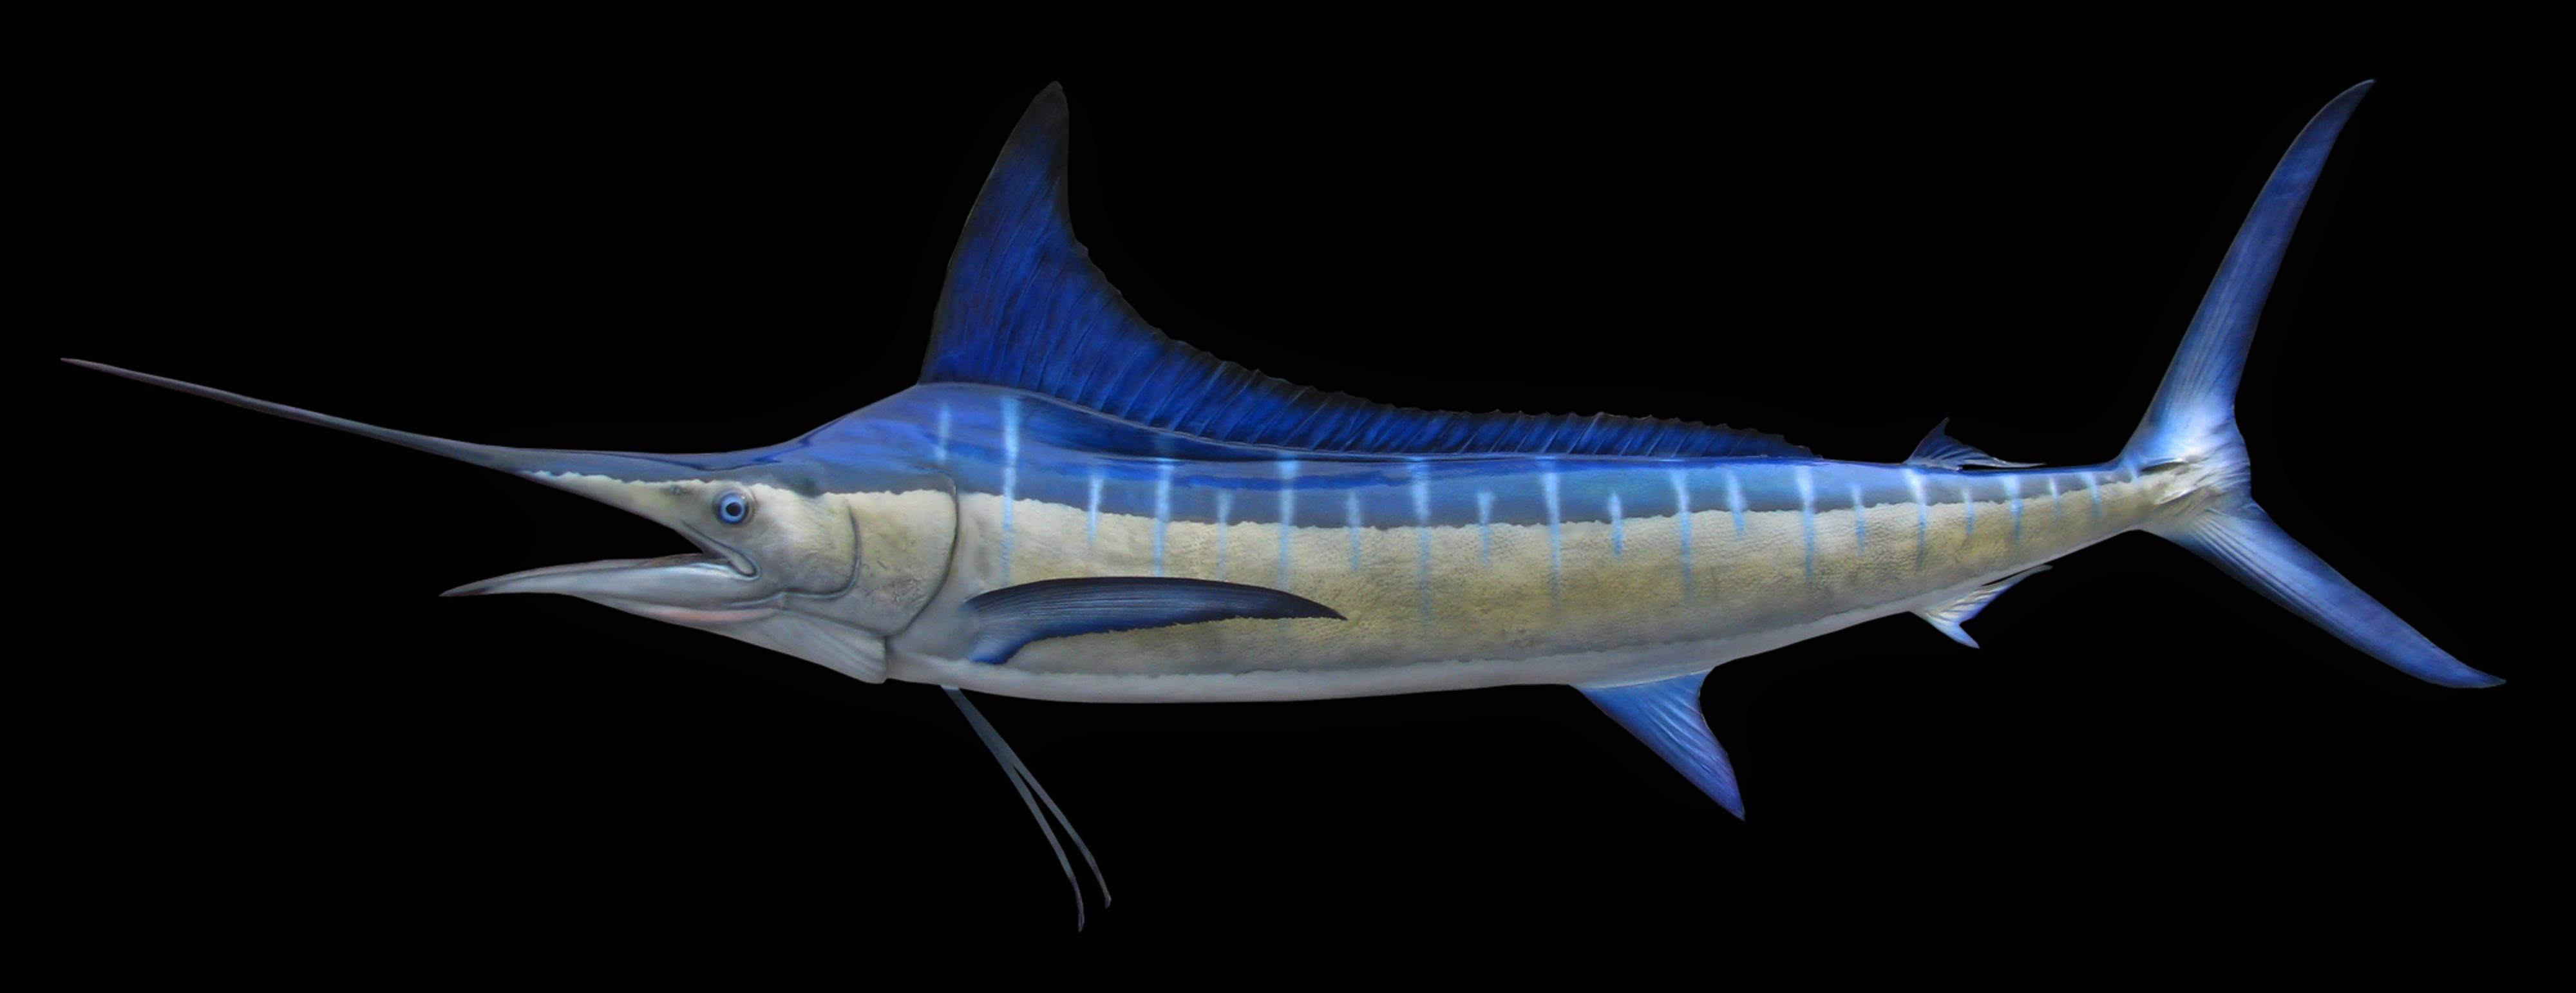 Striped Marlin Fish Mount and Fish Replicas | Coast-to-Coast